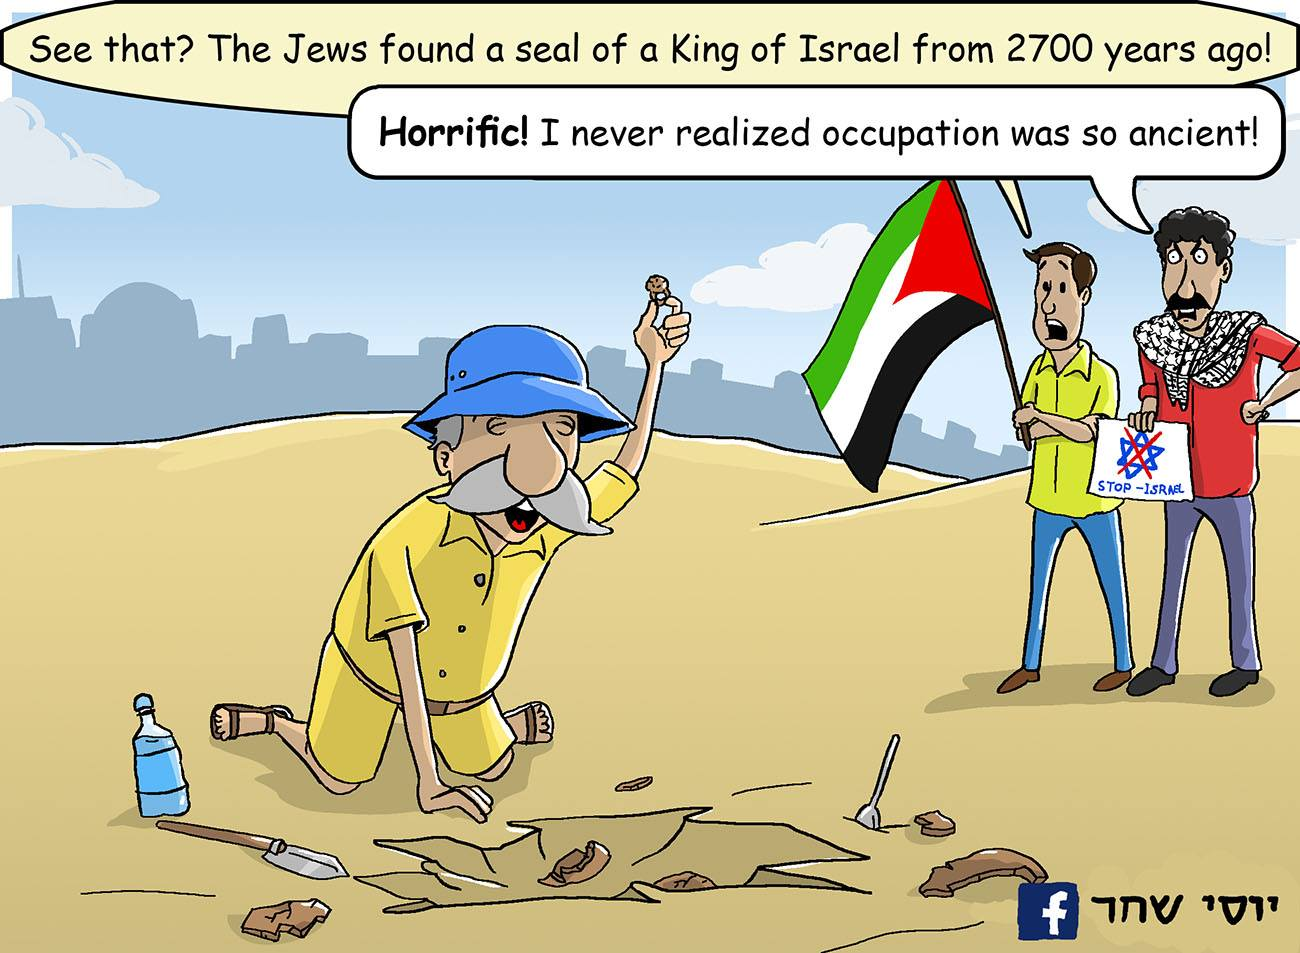 Jews ancient ties to land